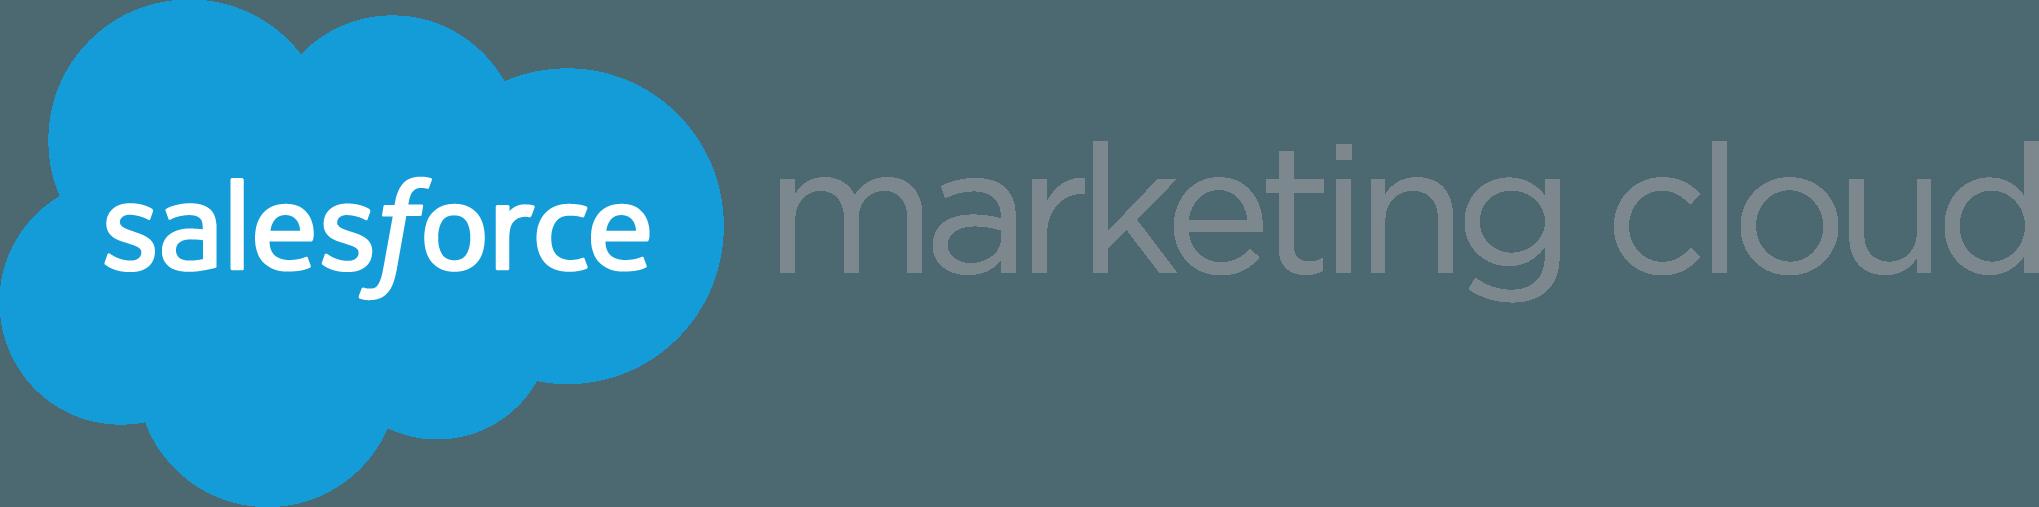 Salesforce marketing cloud logo